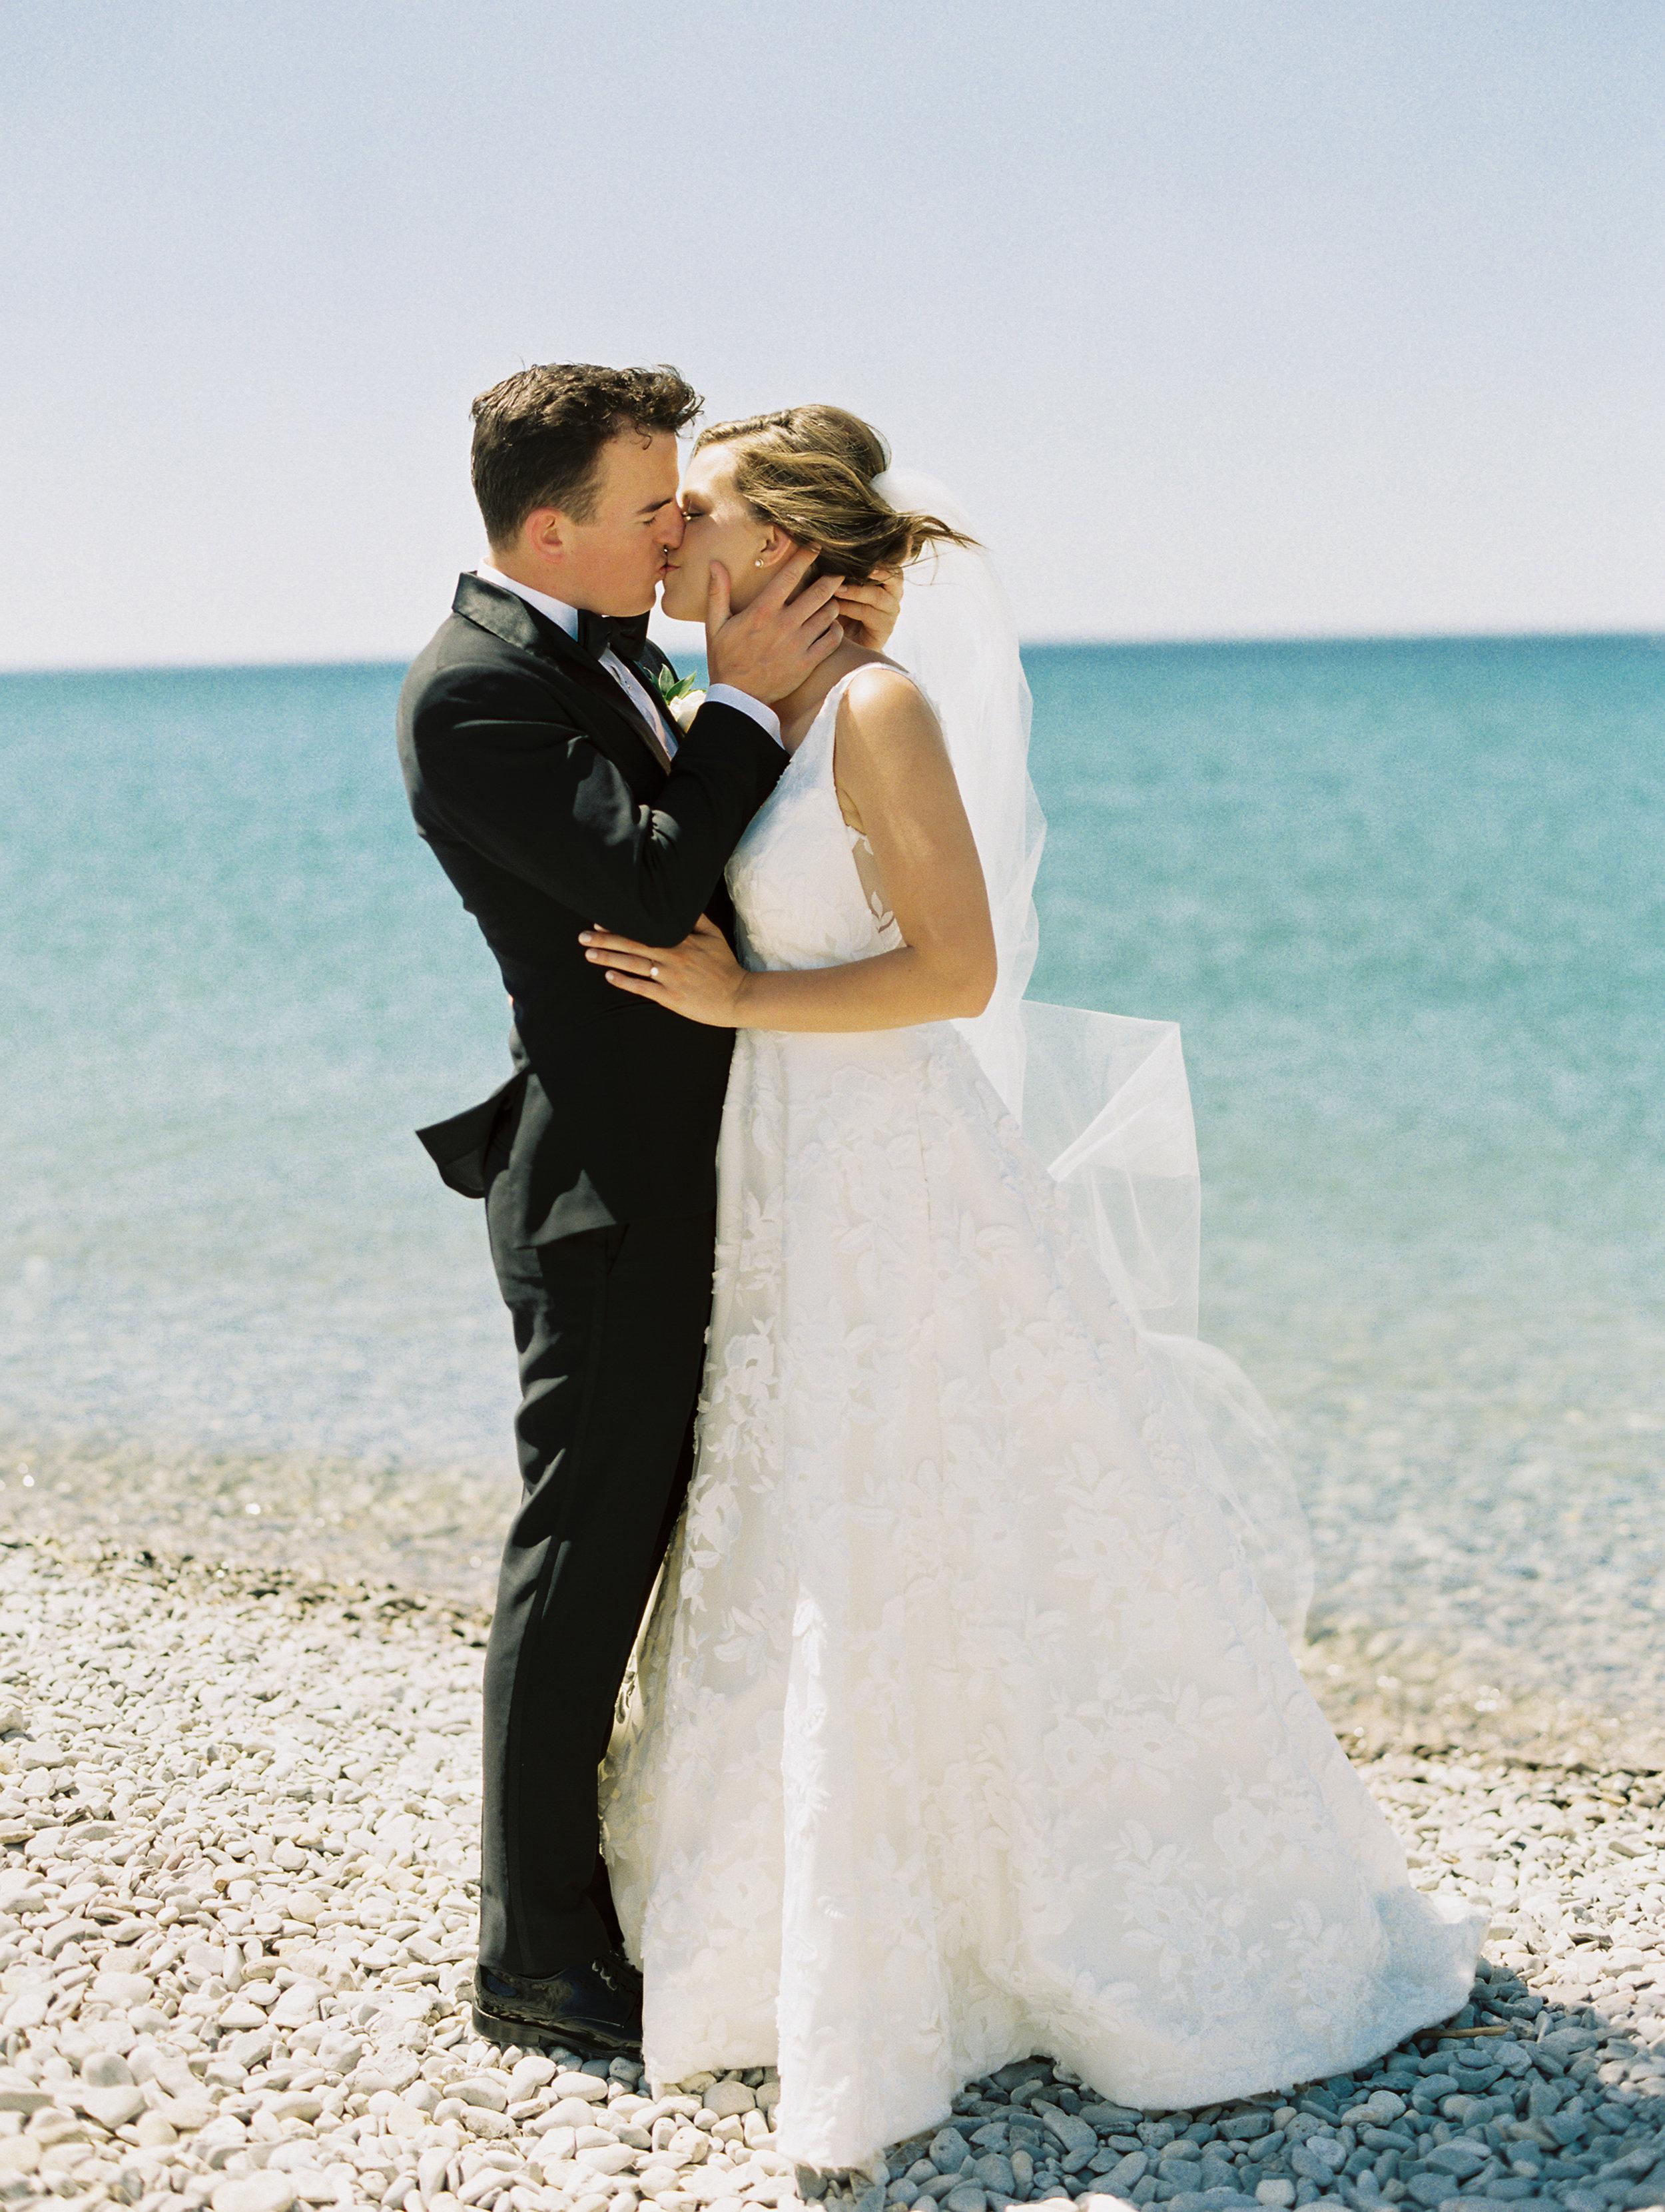 DeGuilio+Wedding+Bridal+Partyf-56.jpg